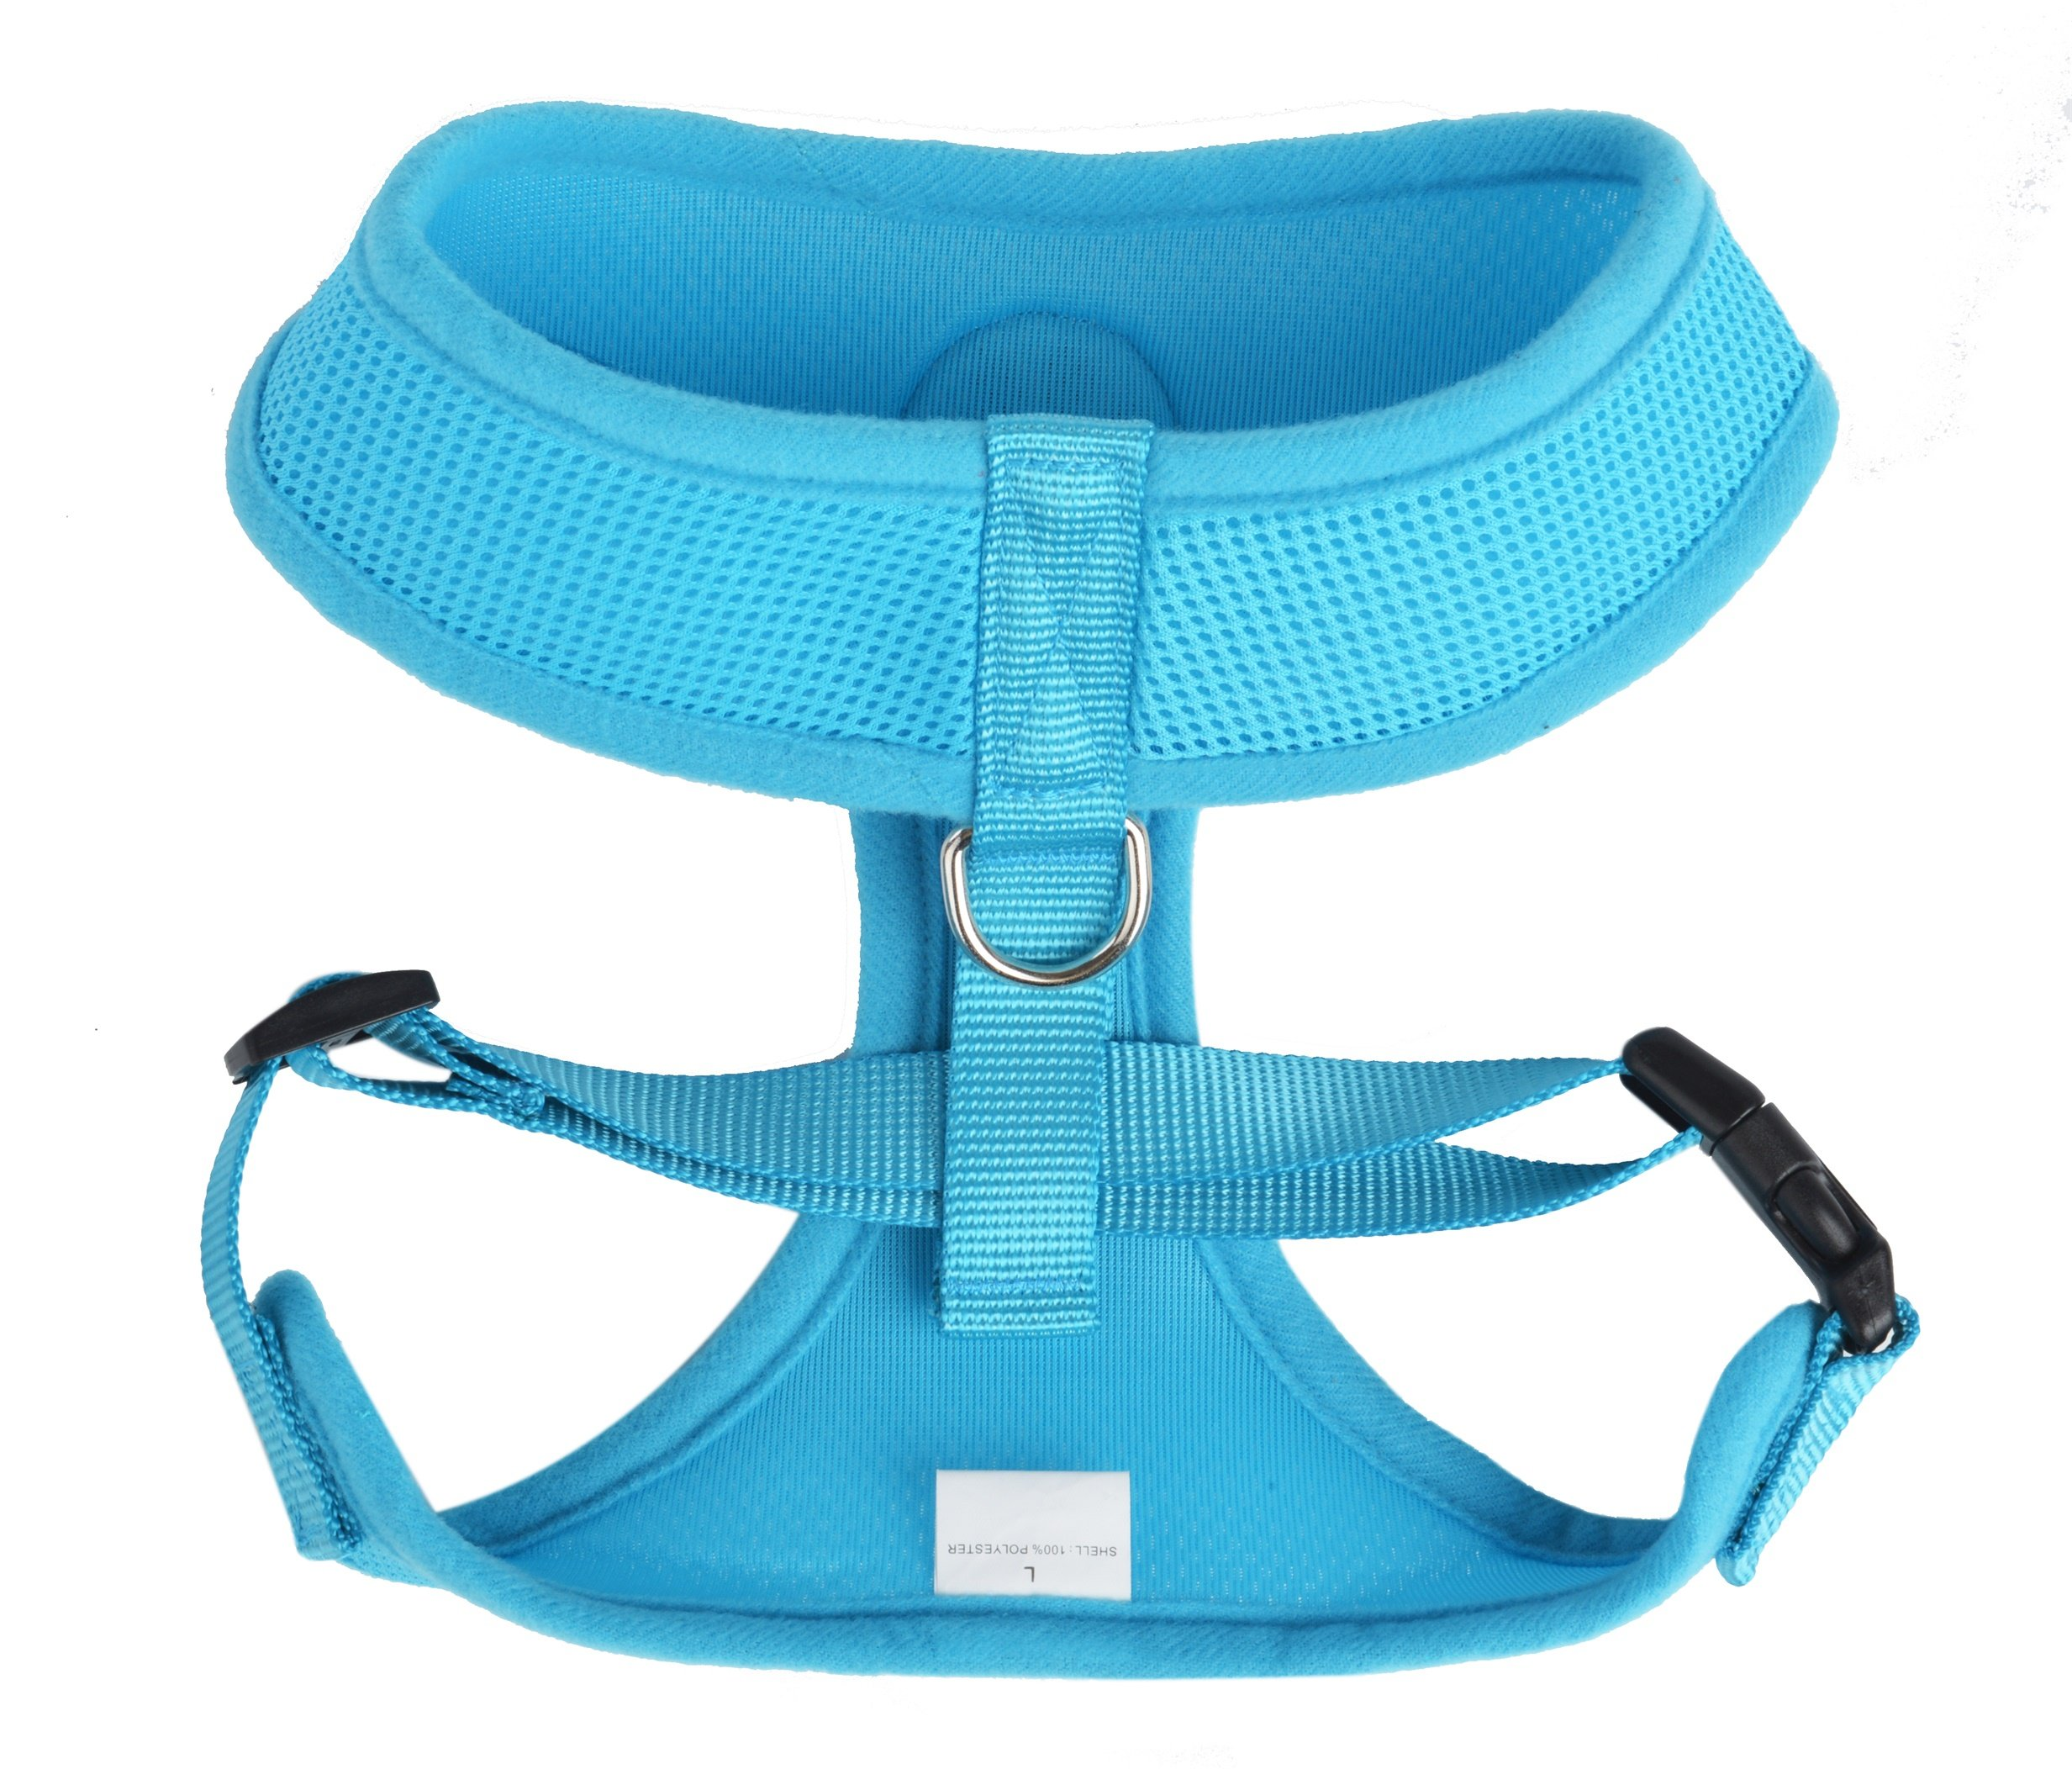 BINGPET BB5001 Soft Mesh Dog Harness Pet Walking Vest Puppy Padded Harnesses Adjustable, Blue Large by BINGPET (Image #2)